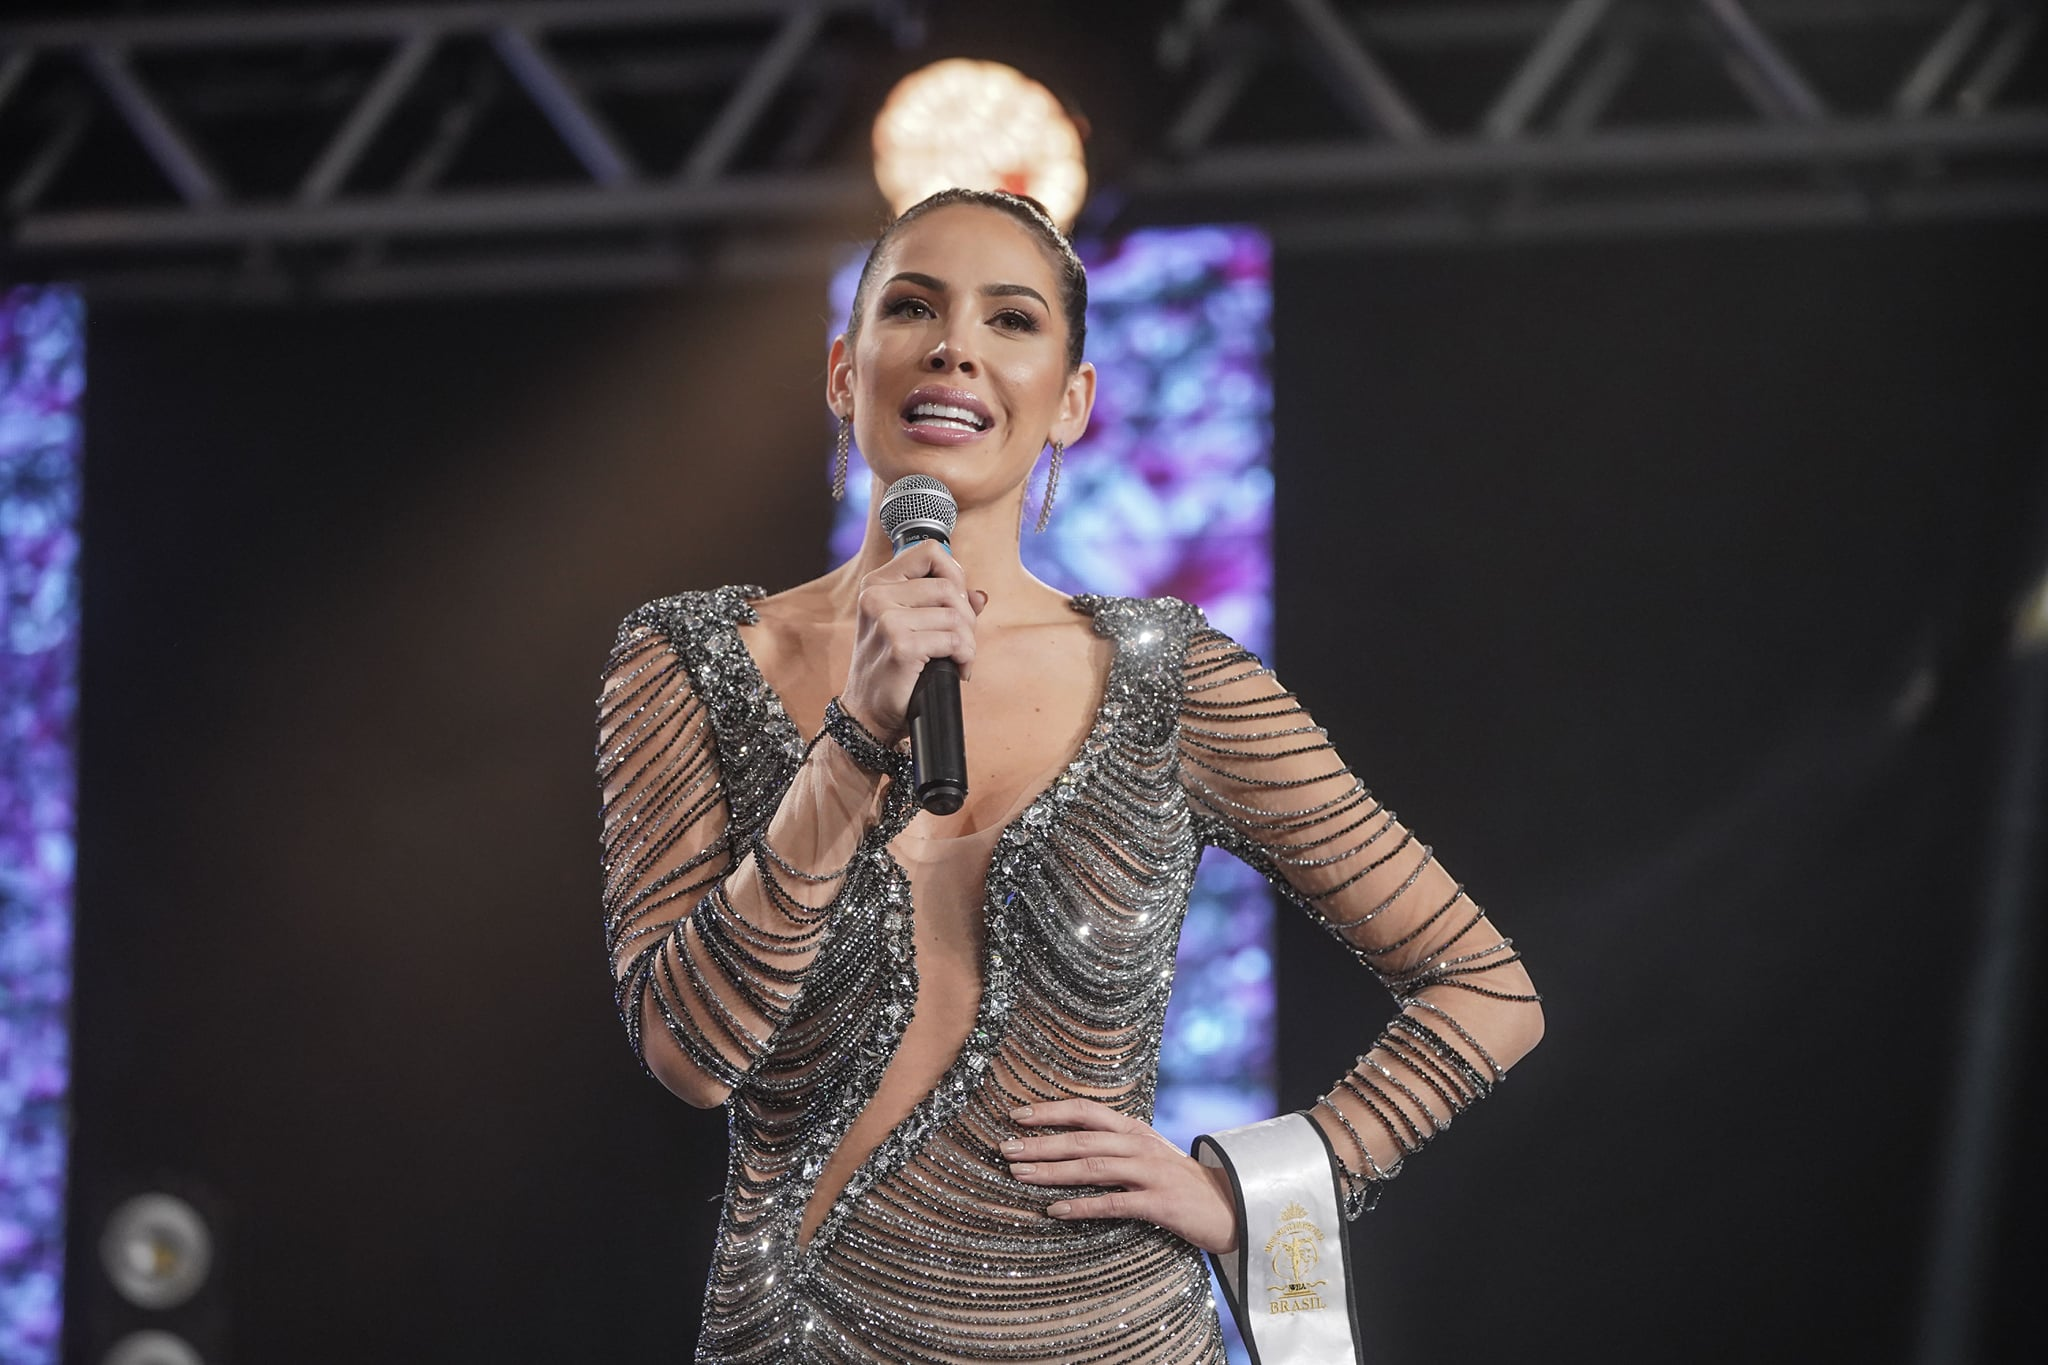 bruna zanardo, 1st runner-up de miss supranational brazil 2020/miss brasil internacional 2017/miss brasil terra 2016. - Página 19 12945710